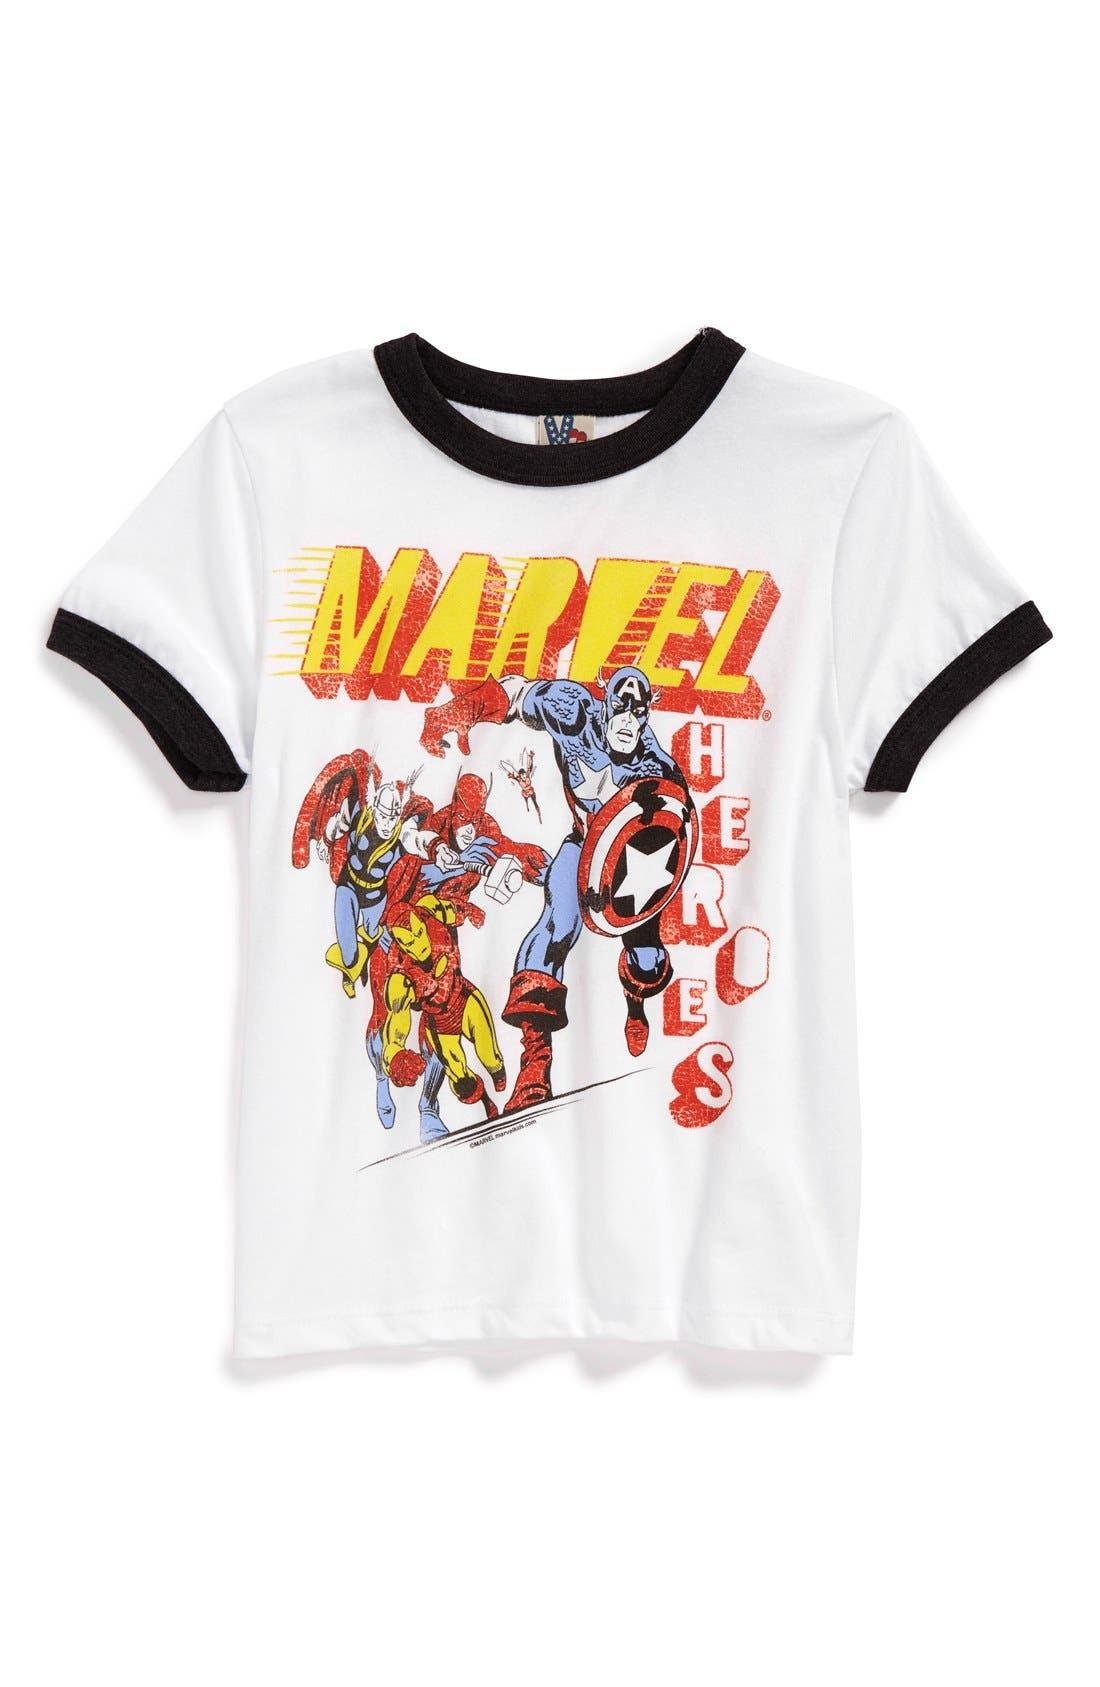 Alternate Image 1 Selected - Junk Food 'Marvel® Heroes' Graphic T-Shirt (Toddler Boys)